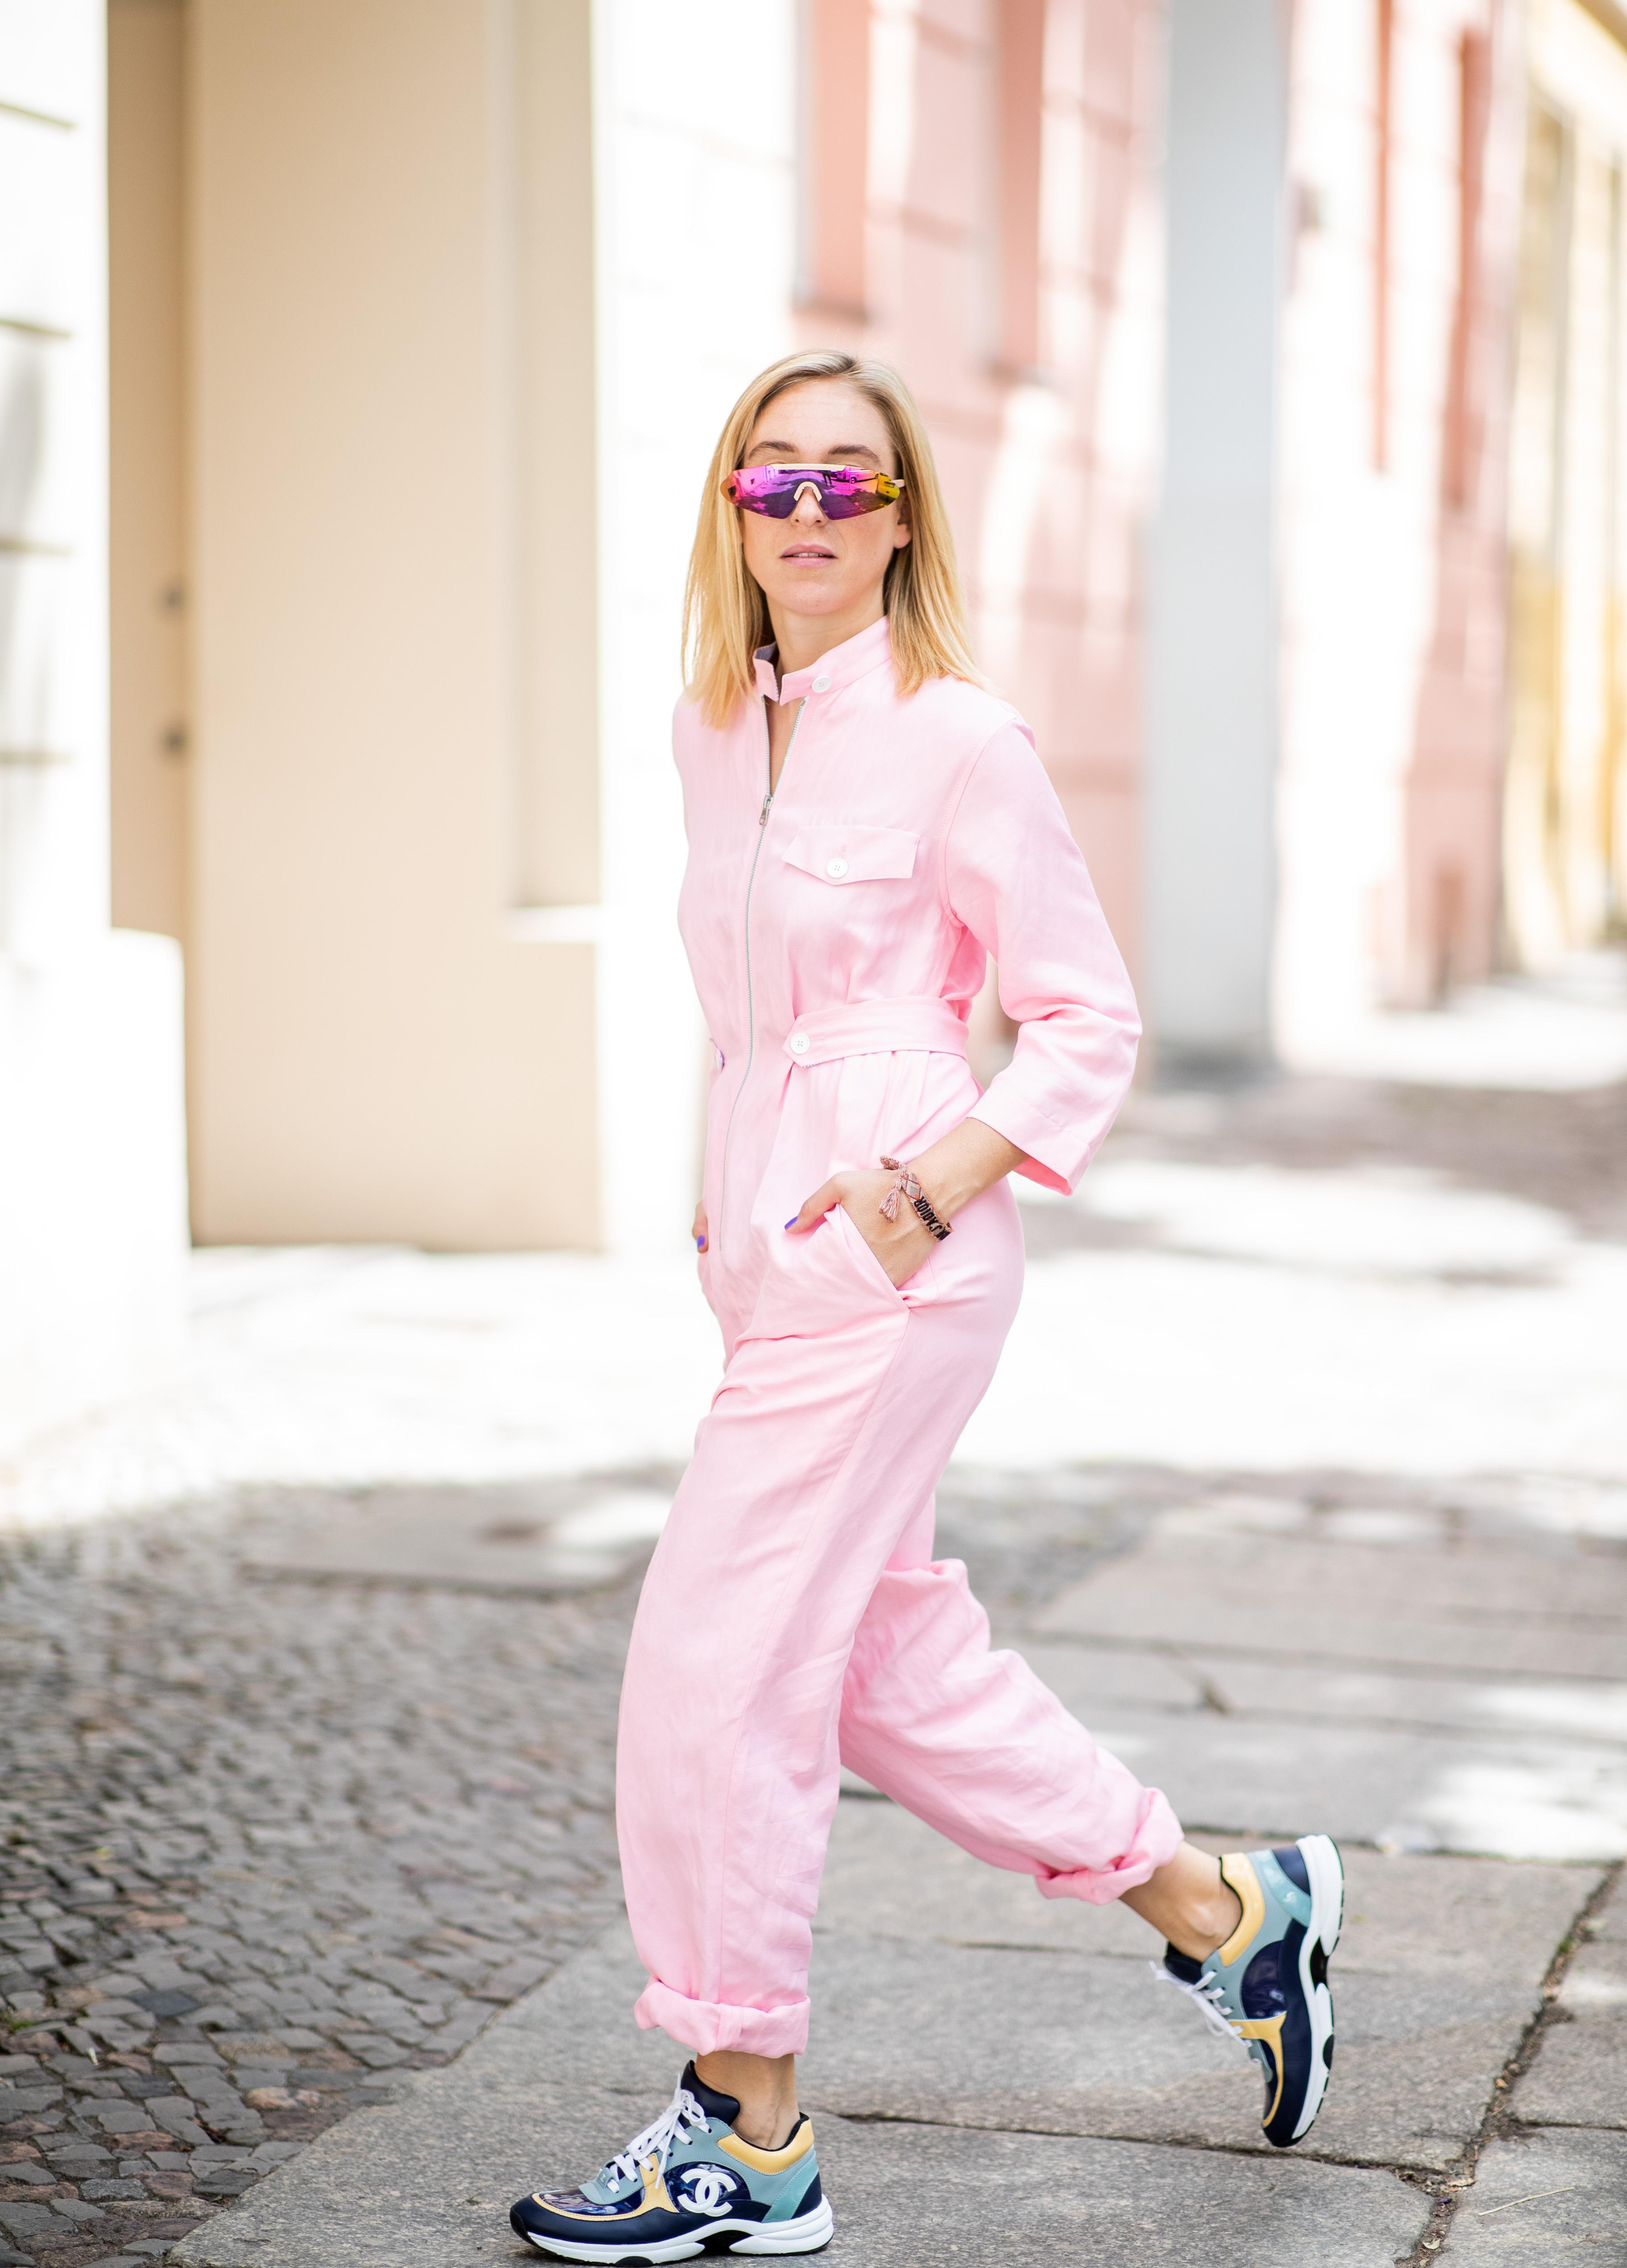 72ed5cb61a0 Summer 2018 Instagram Fashion Trends: Polka Dots, Denim Skirts, Sneakers